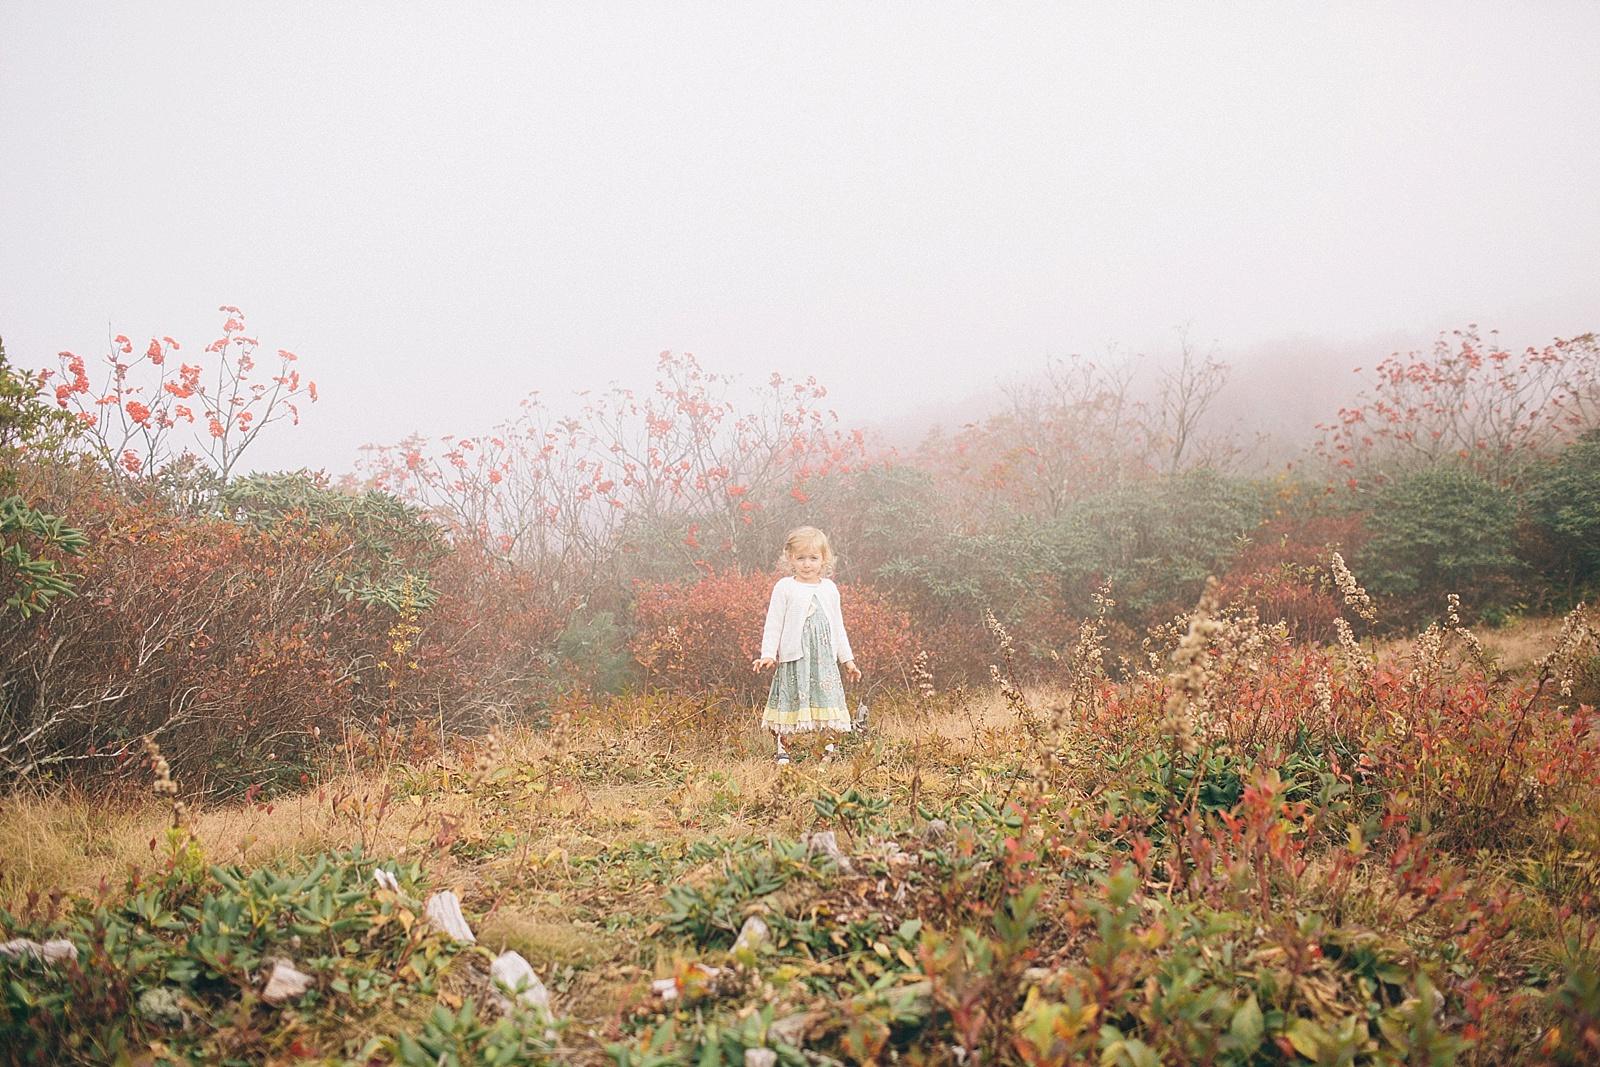 diana-elizabeth-blog-travel-fashion-blogger-north-carolina-wedding-elopement-craggy-pinnacle-trail_0010